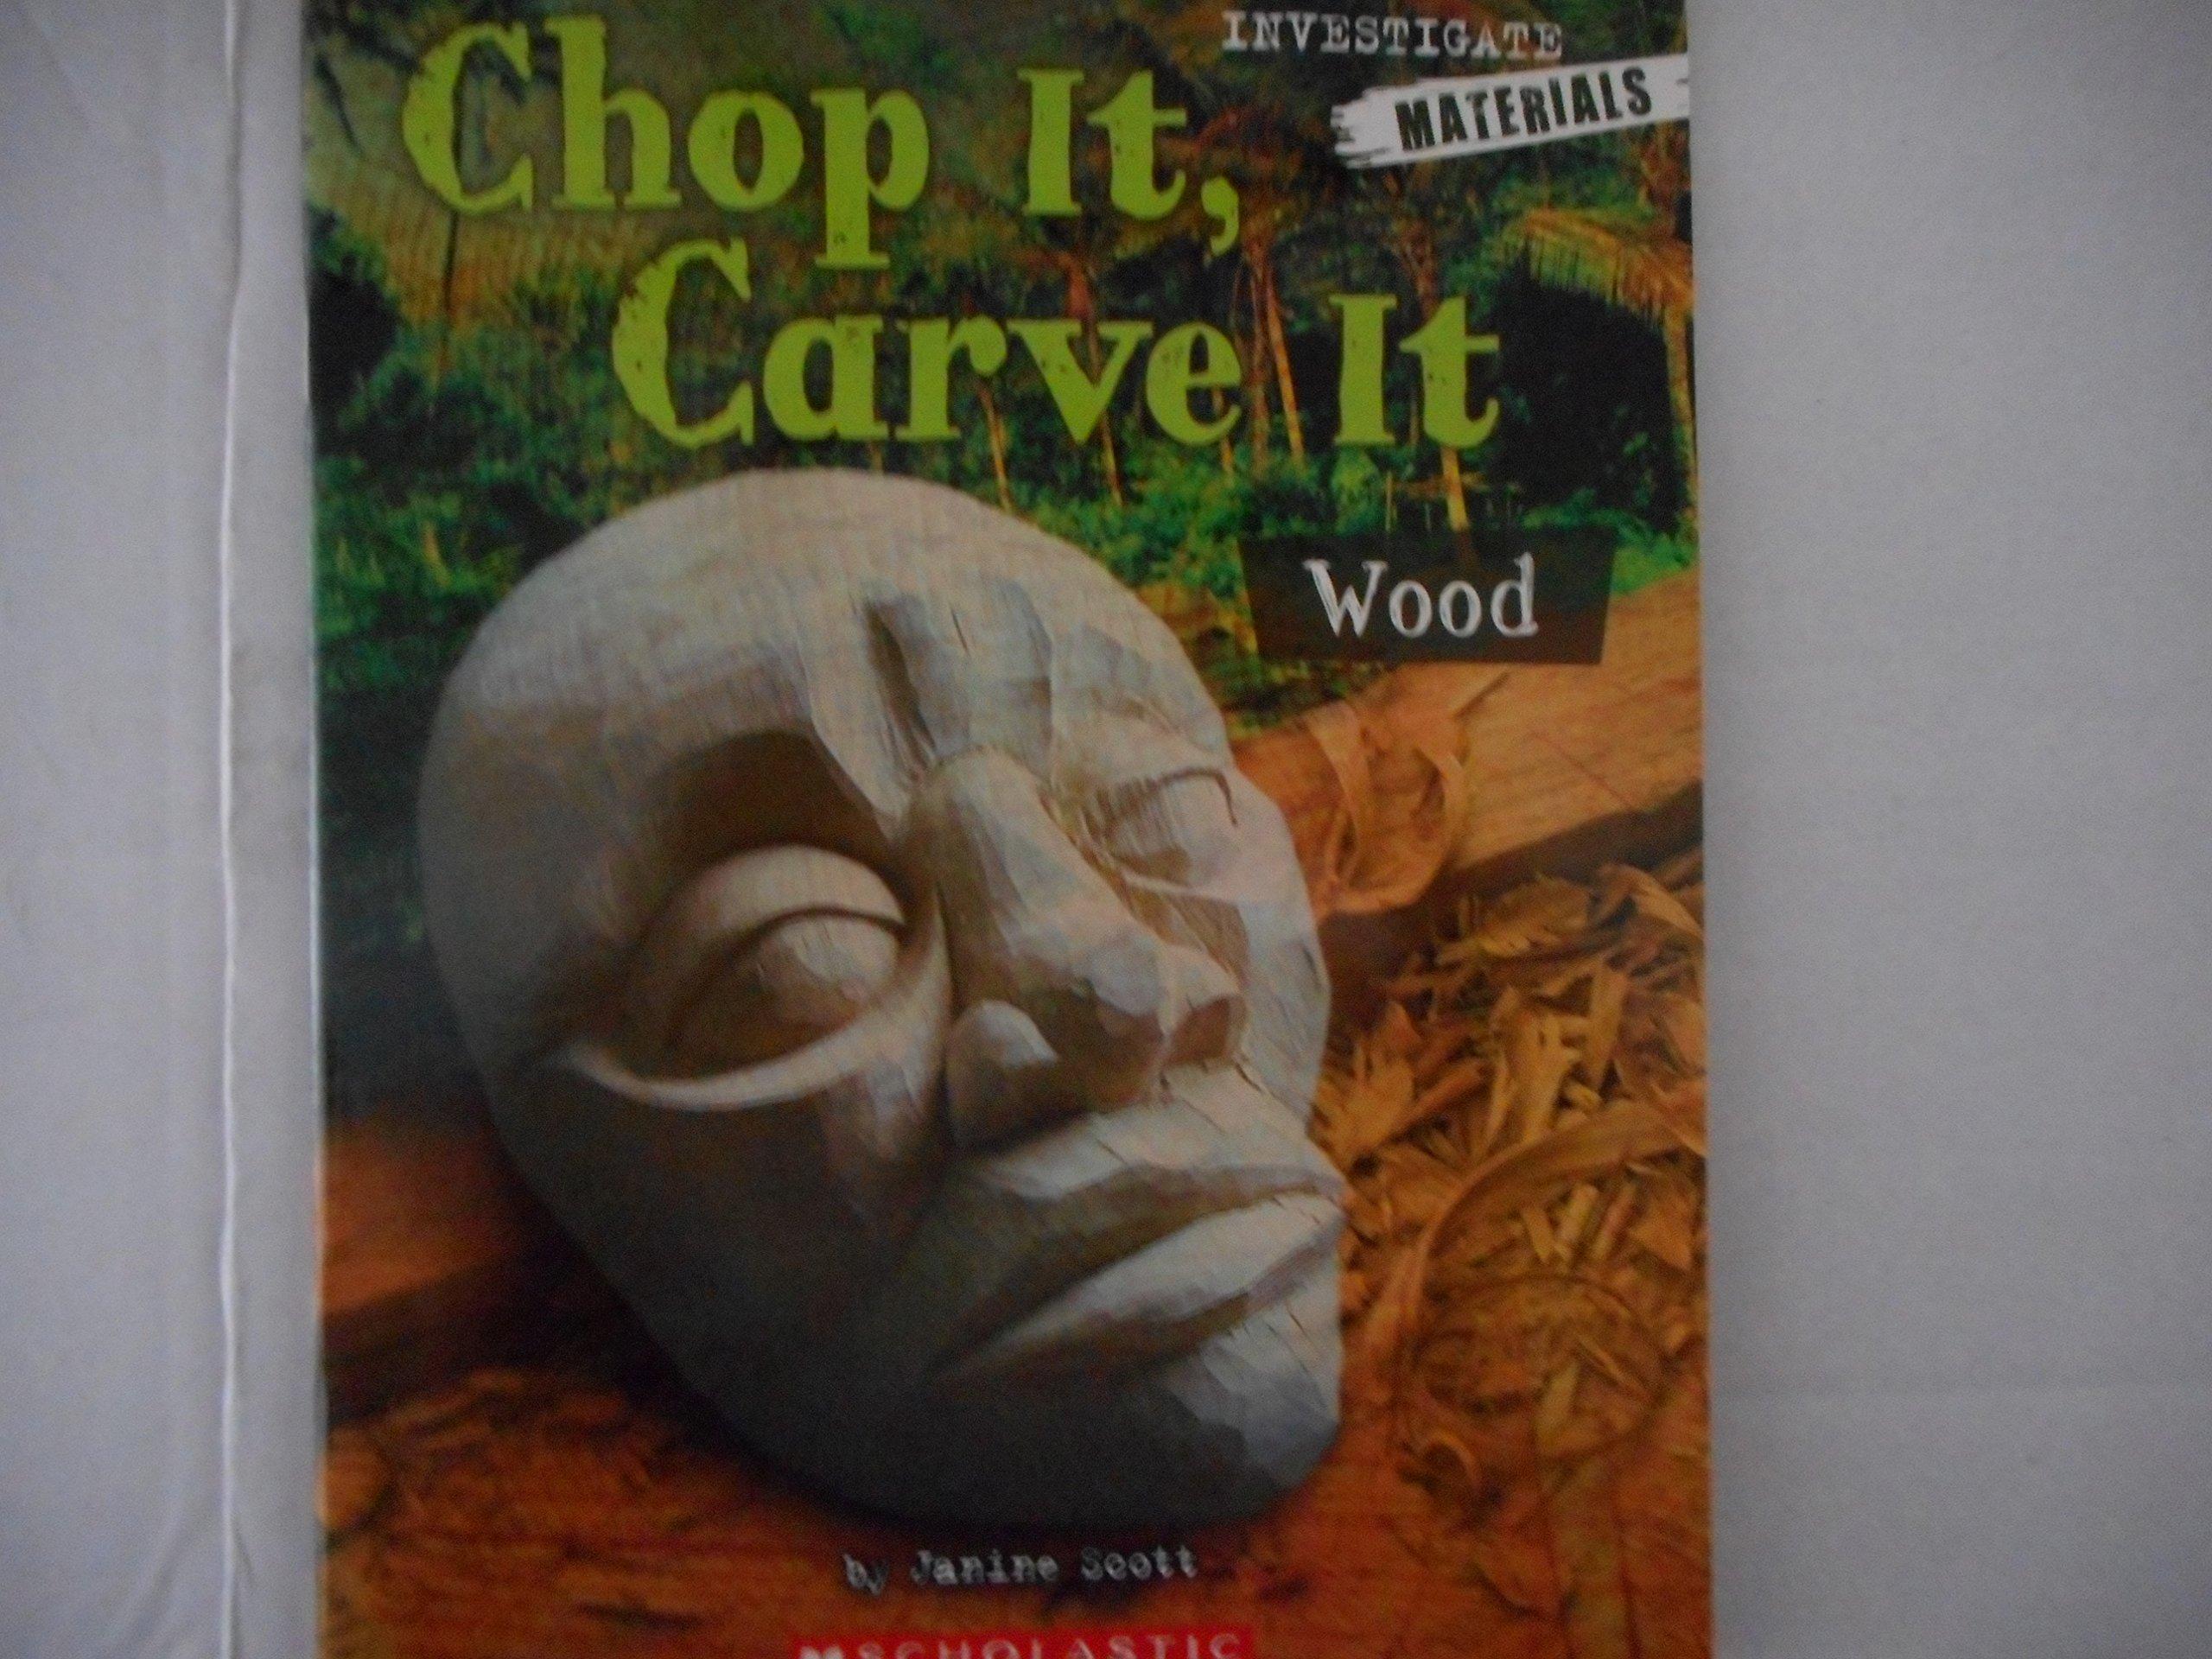 Chop It, Carve It Wood Investigate Materials pdf